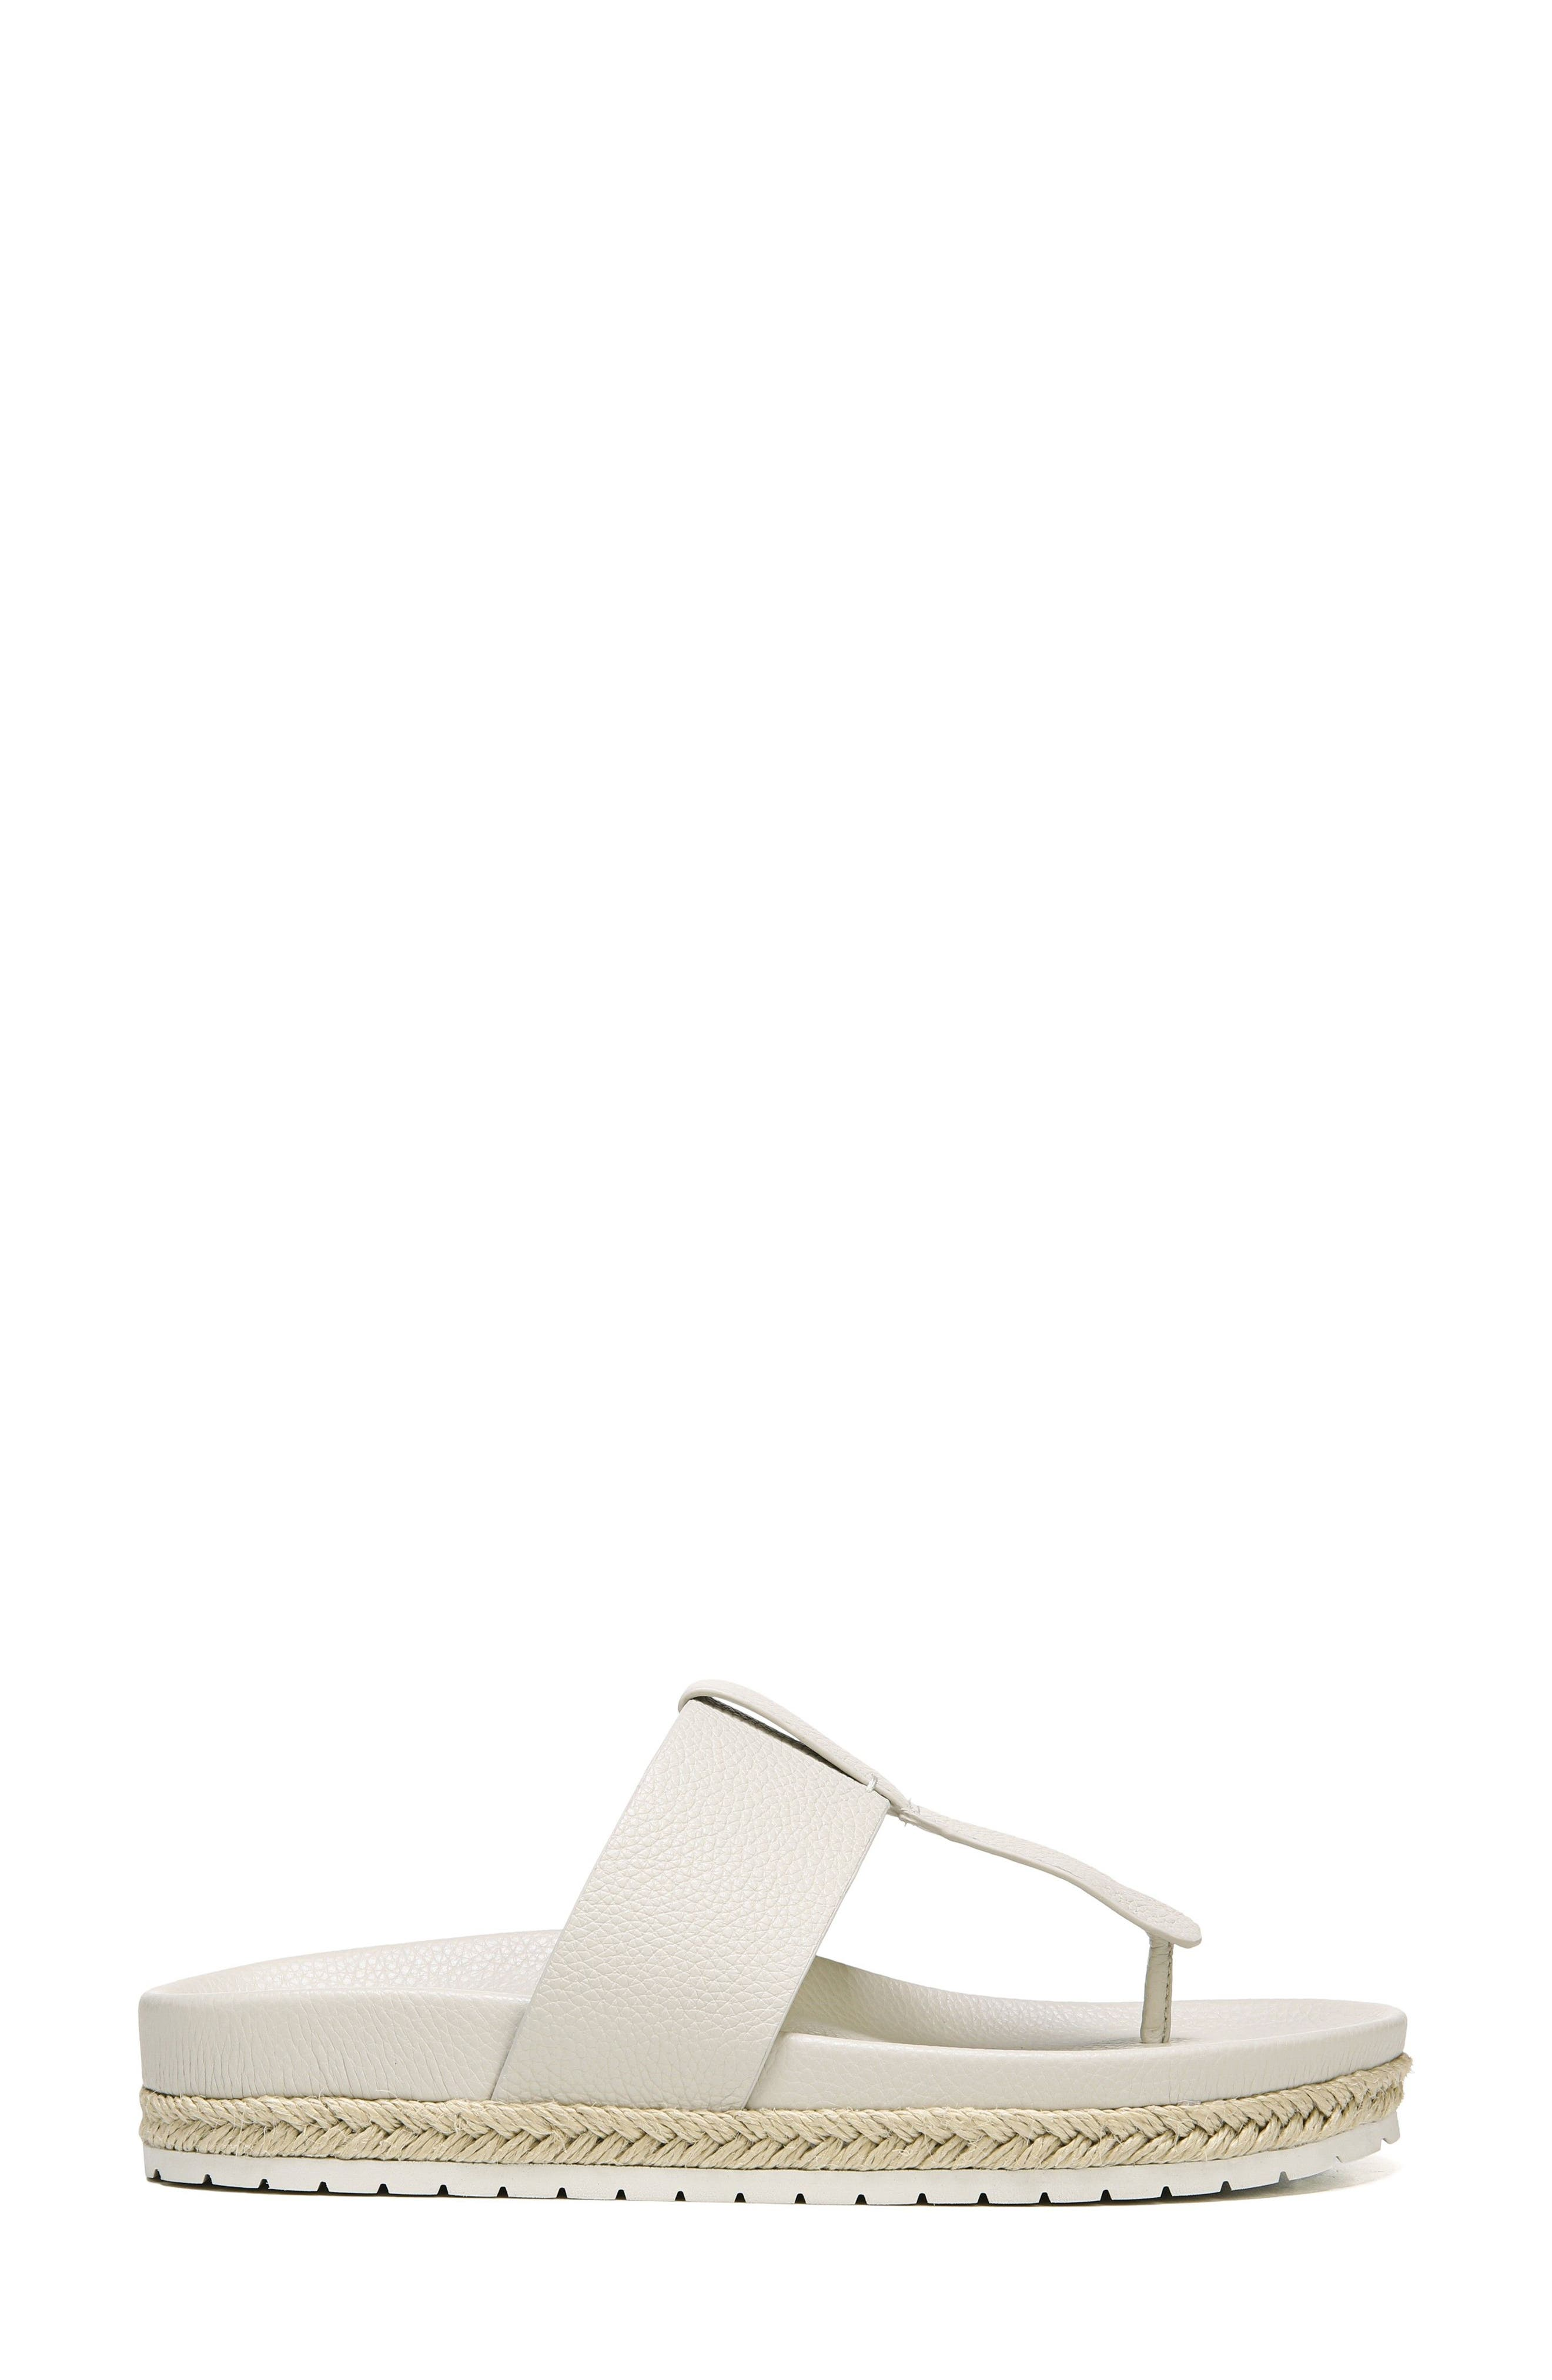 Avani T-Strap Flat Sandal,                             Alternate thumbnail 3, color,                             Oyster